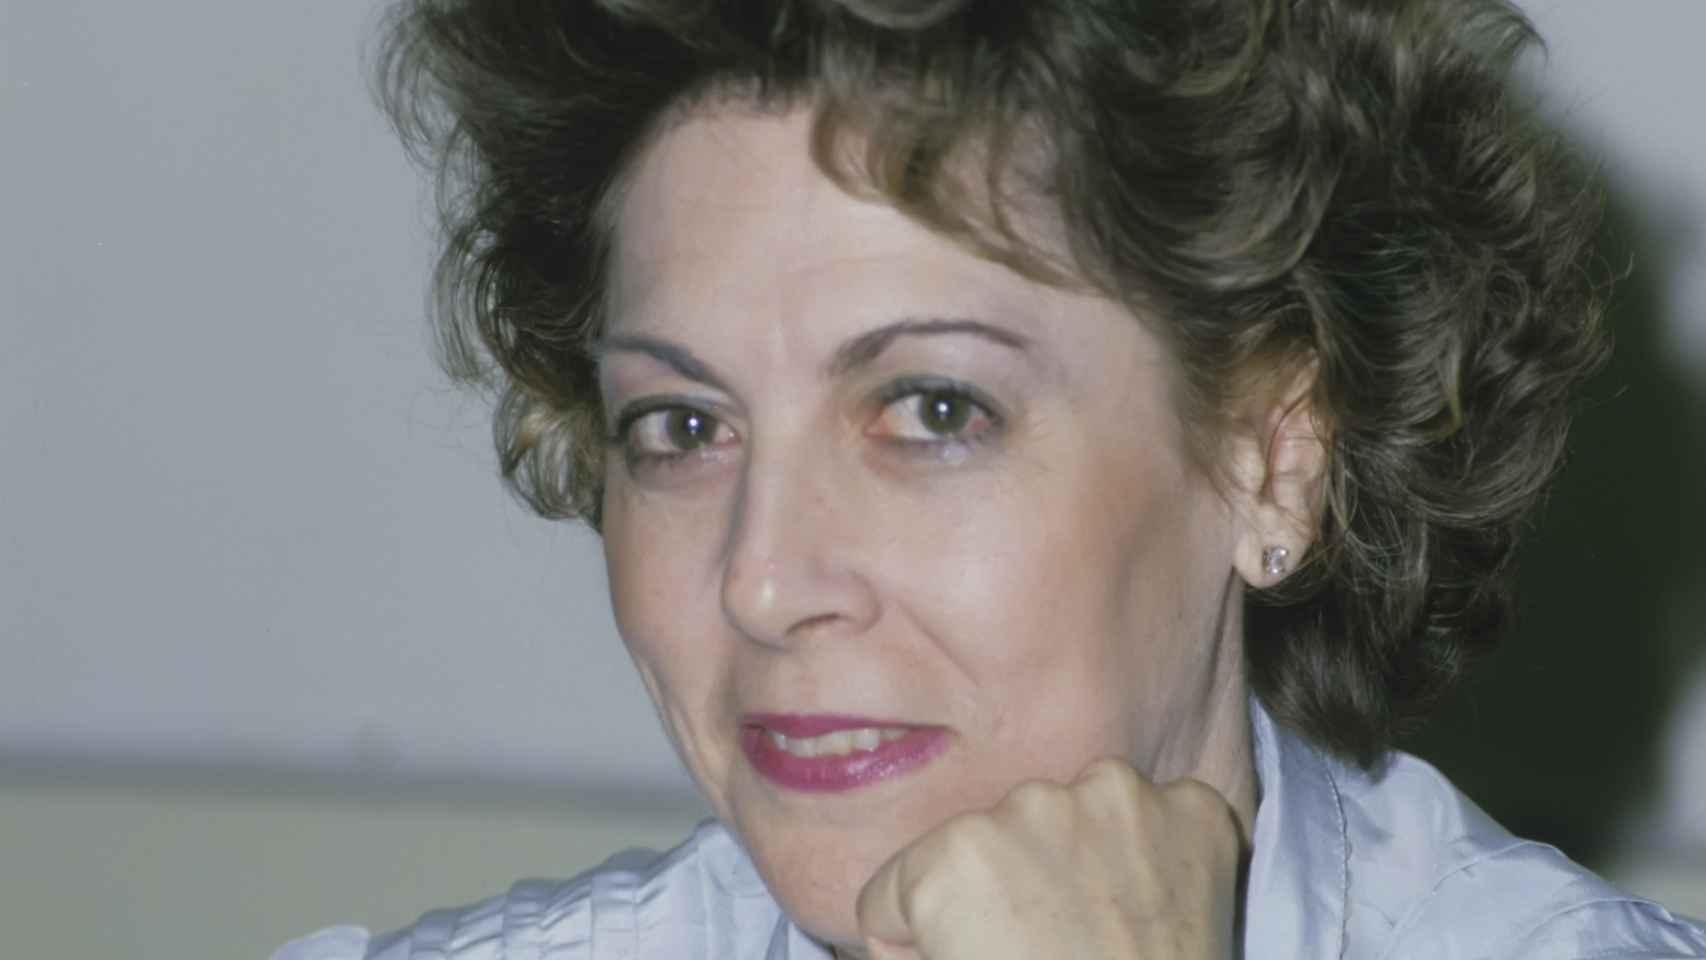 La vida de Paloma Gómez Borrero en imágenes